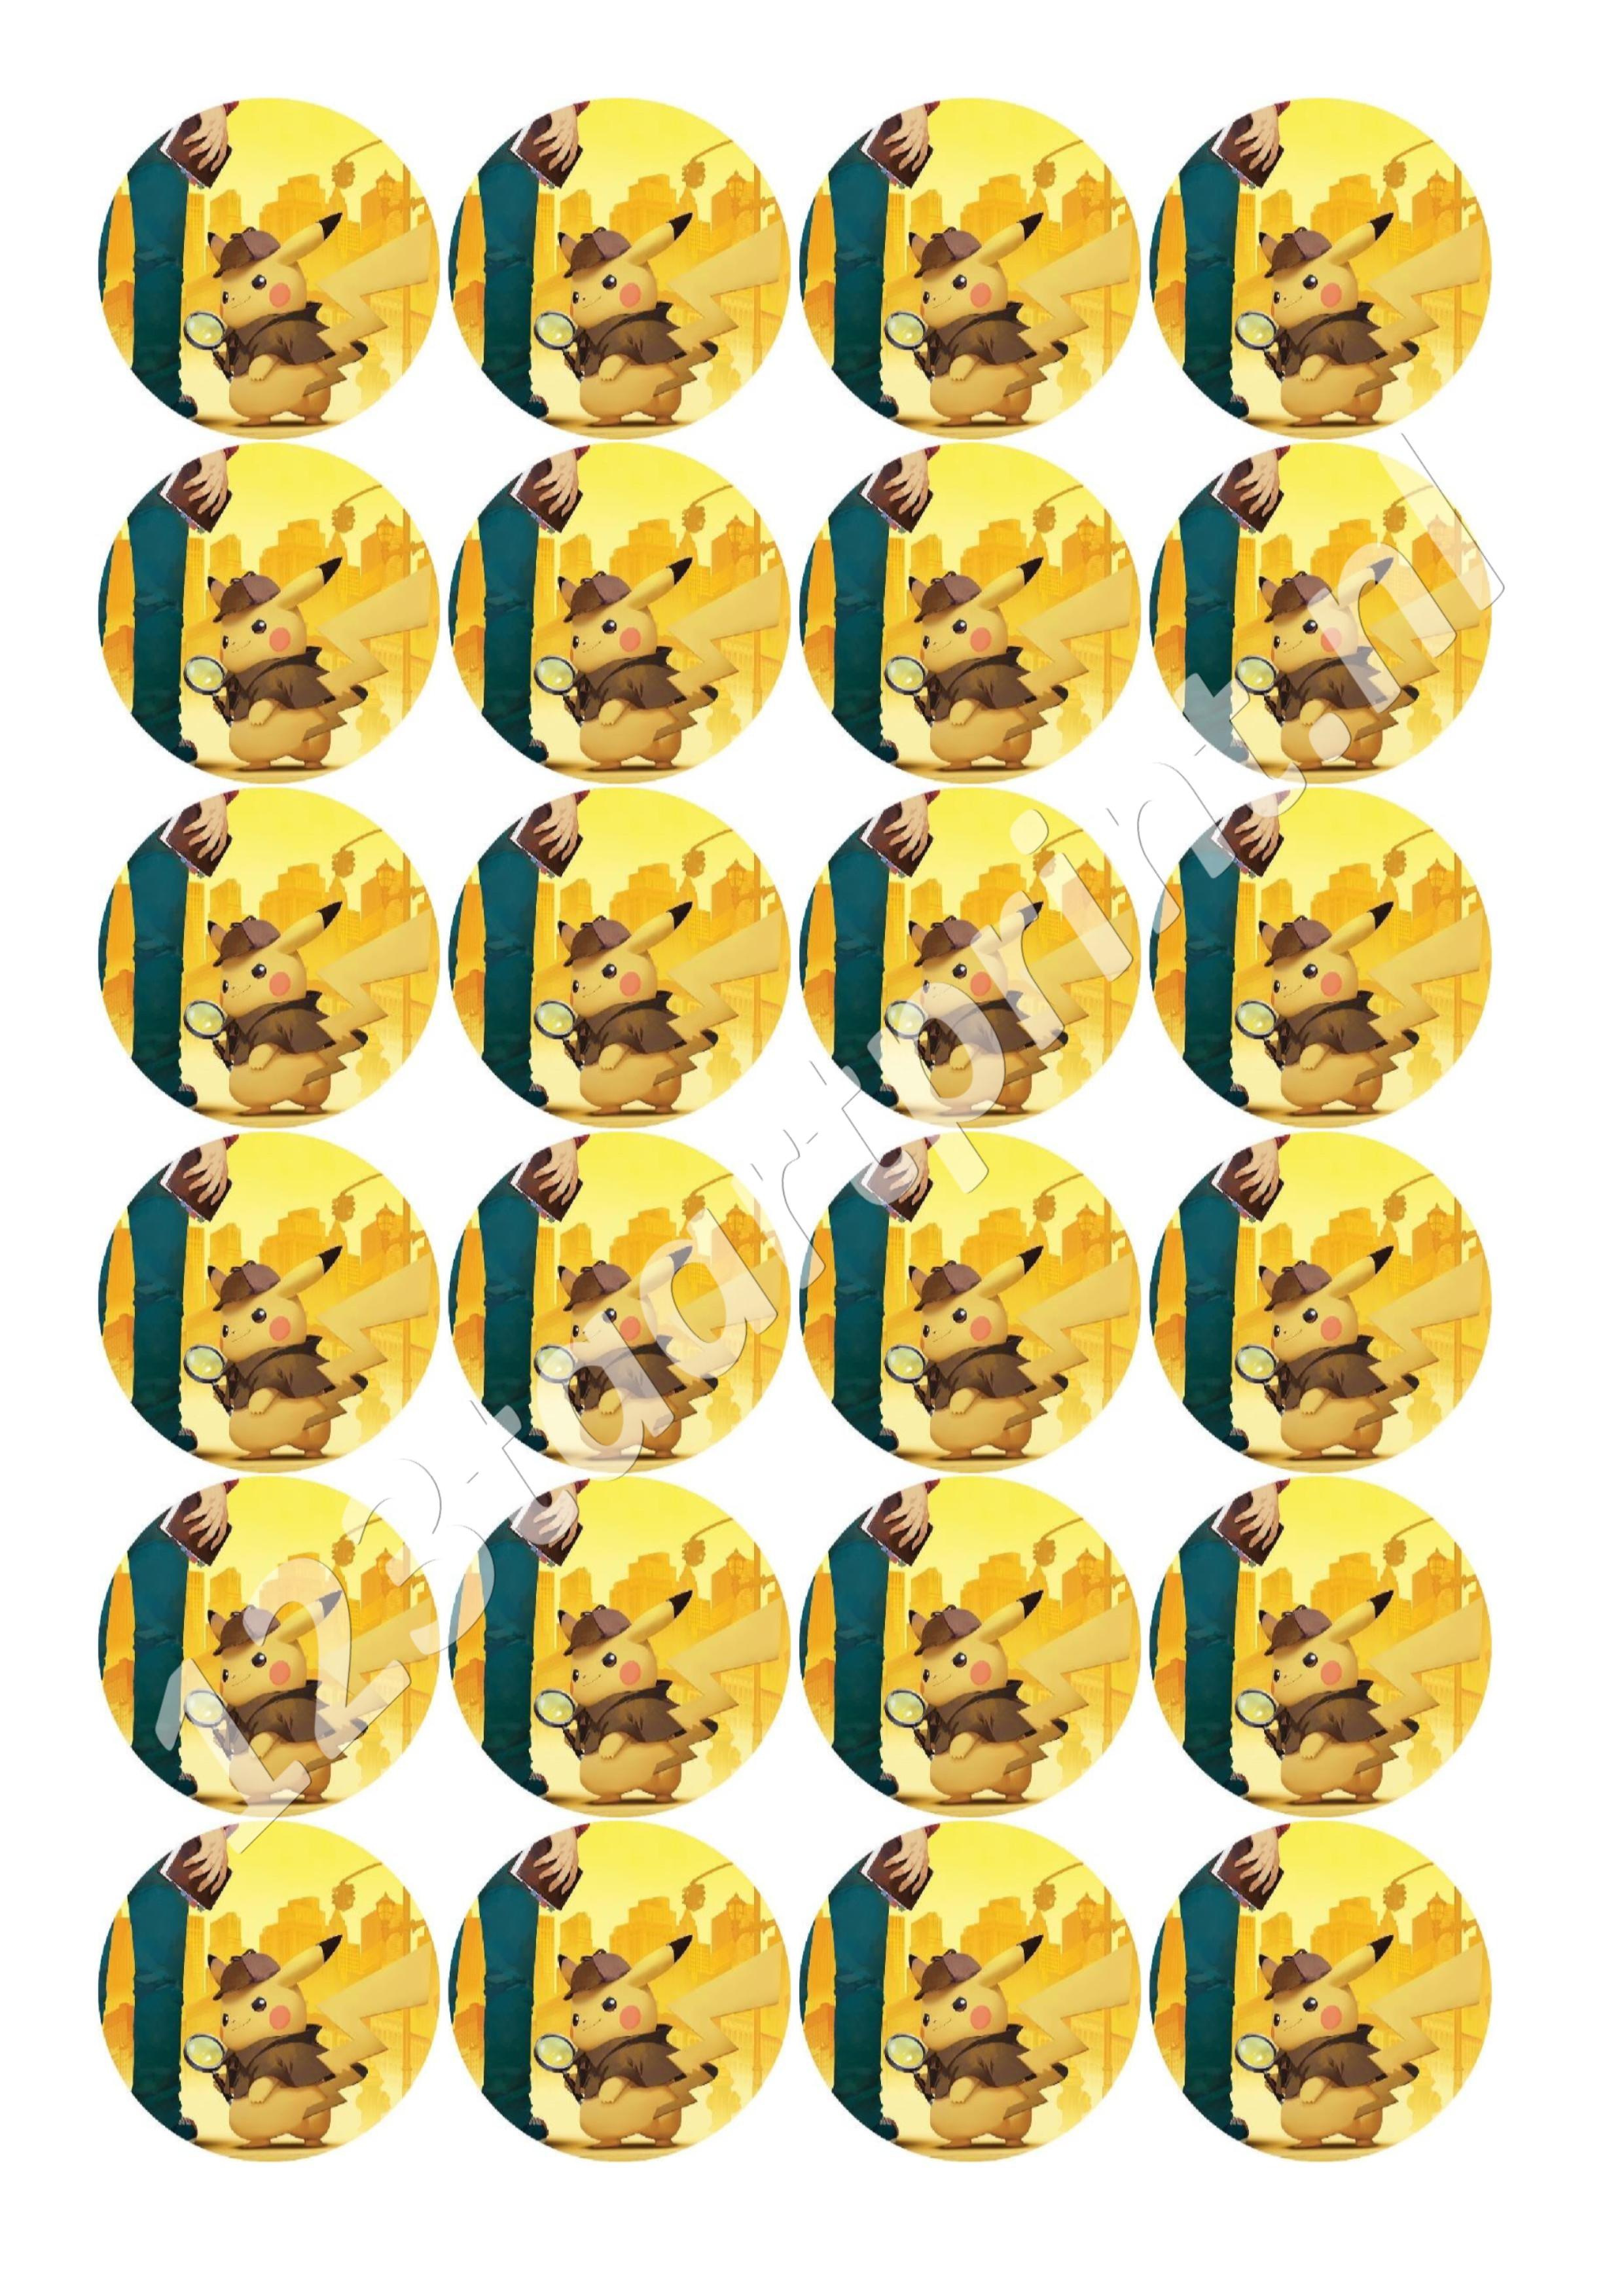 Pokémon Detective Pikachu cupcakes